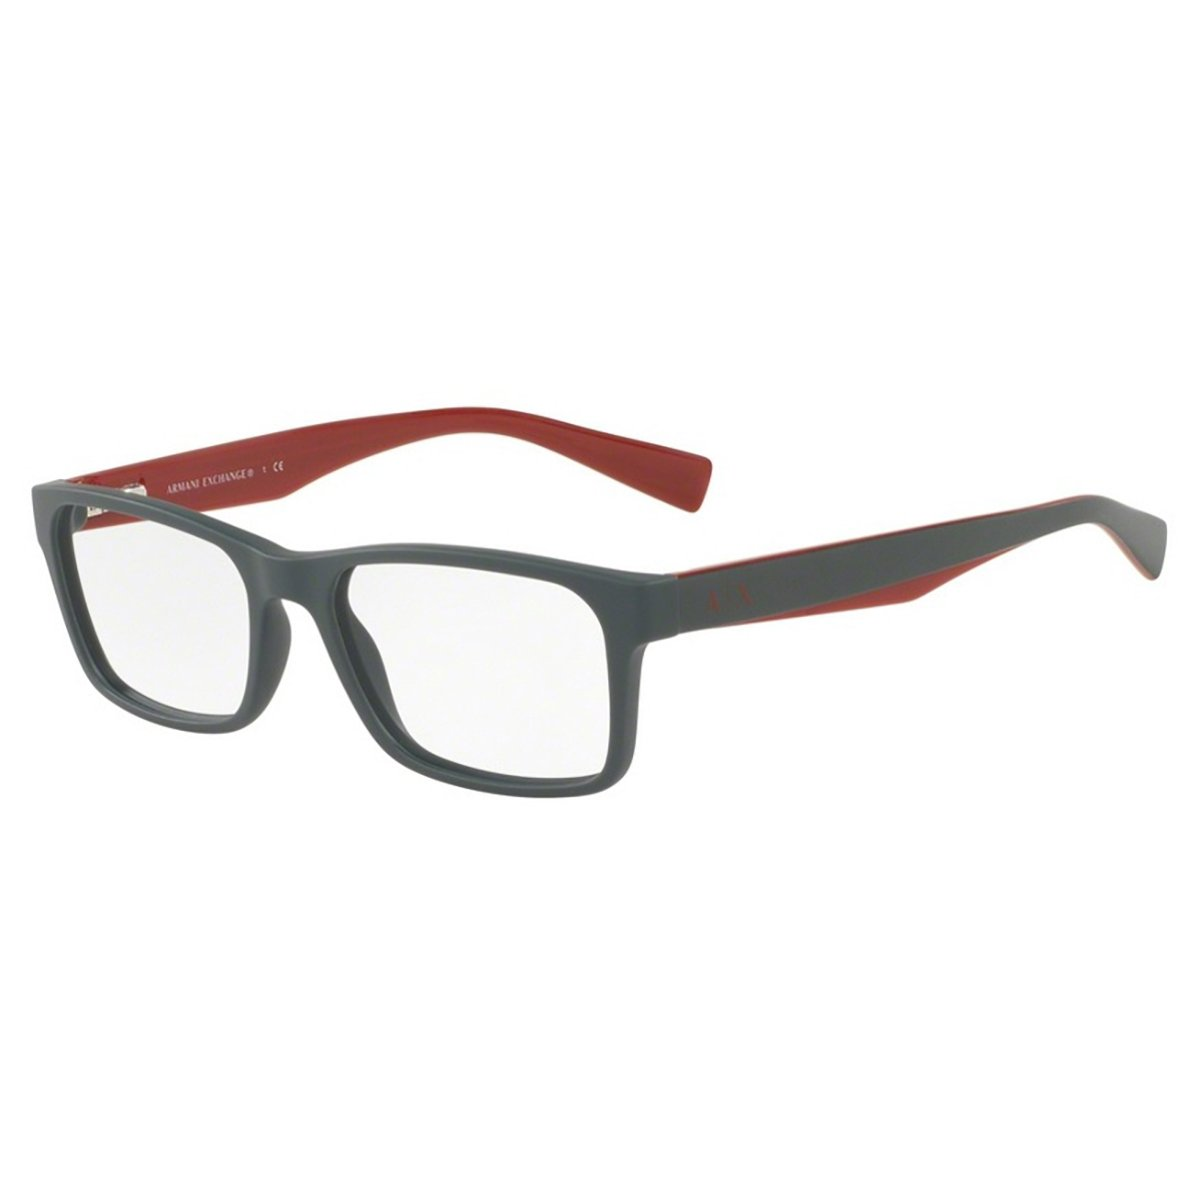 bbb13867ca087 Oculos Ray Ban Lente Transparente Sem Grau – Southern California ...